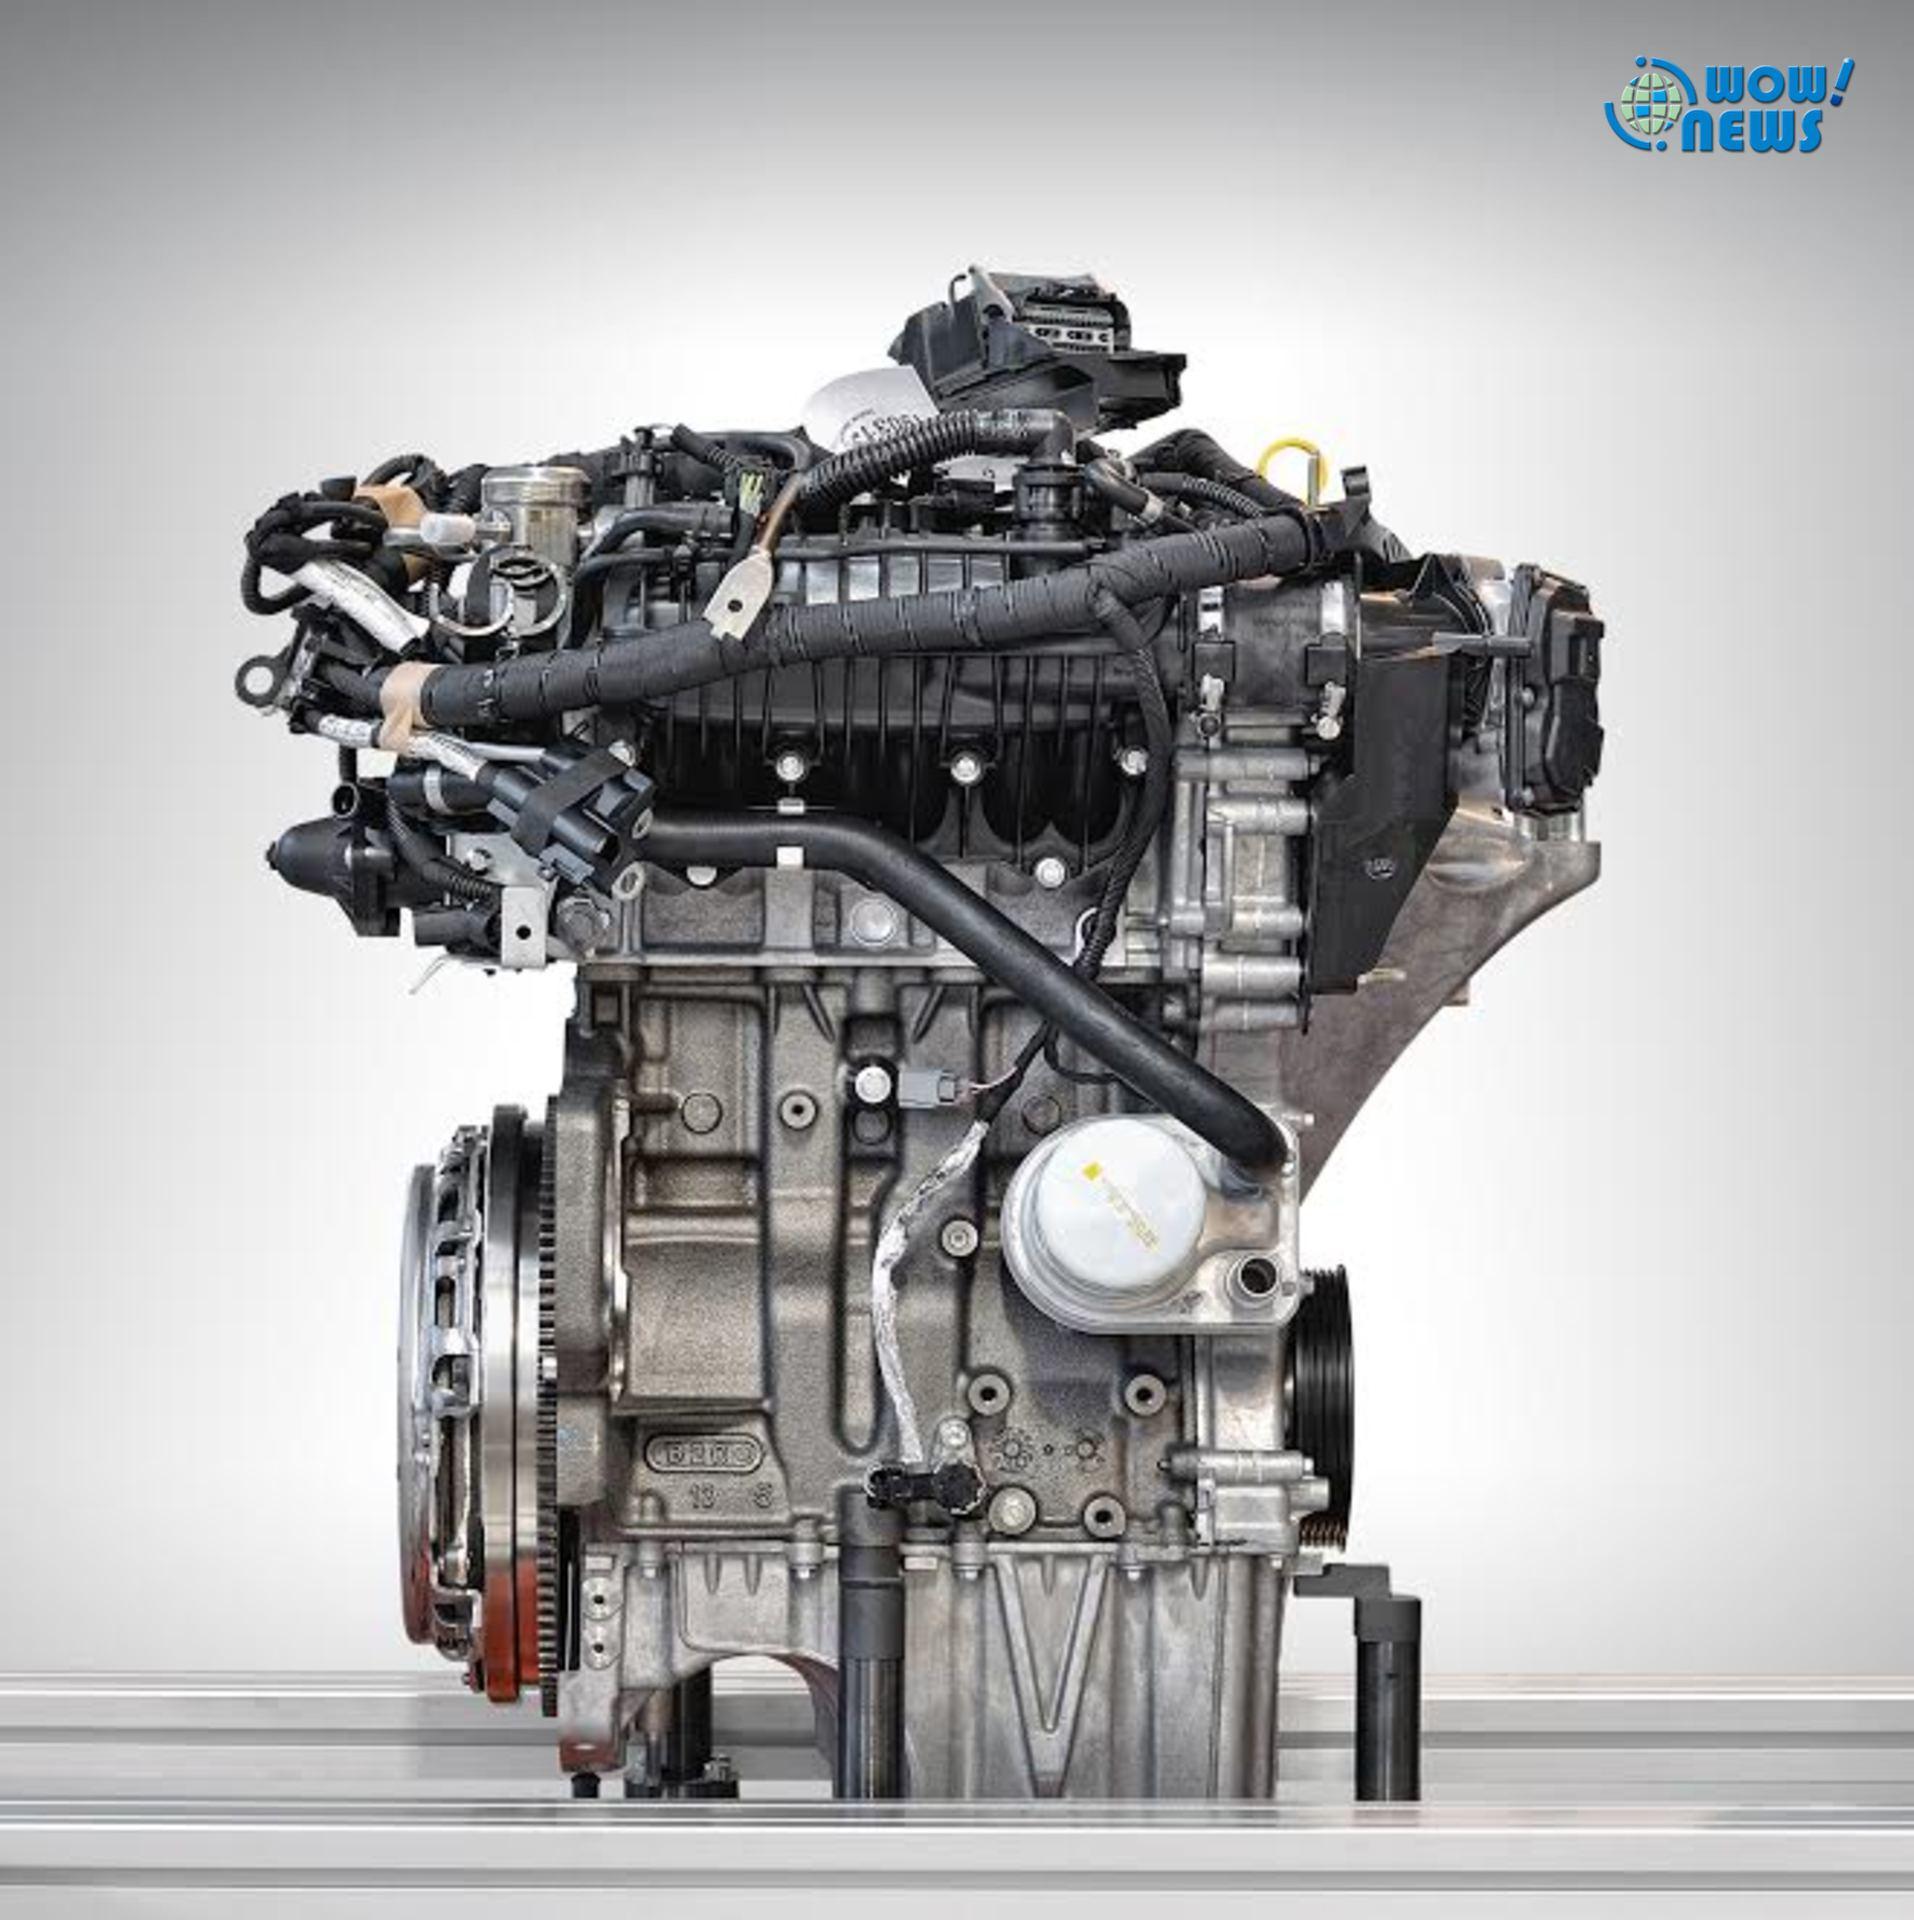 FORD ECOBOOST 125汽油引擎六連霸摘星,再度獲選為2017年國際引擎大賞